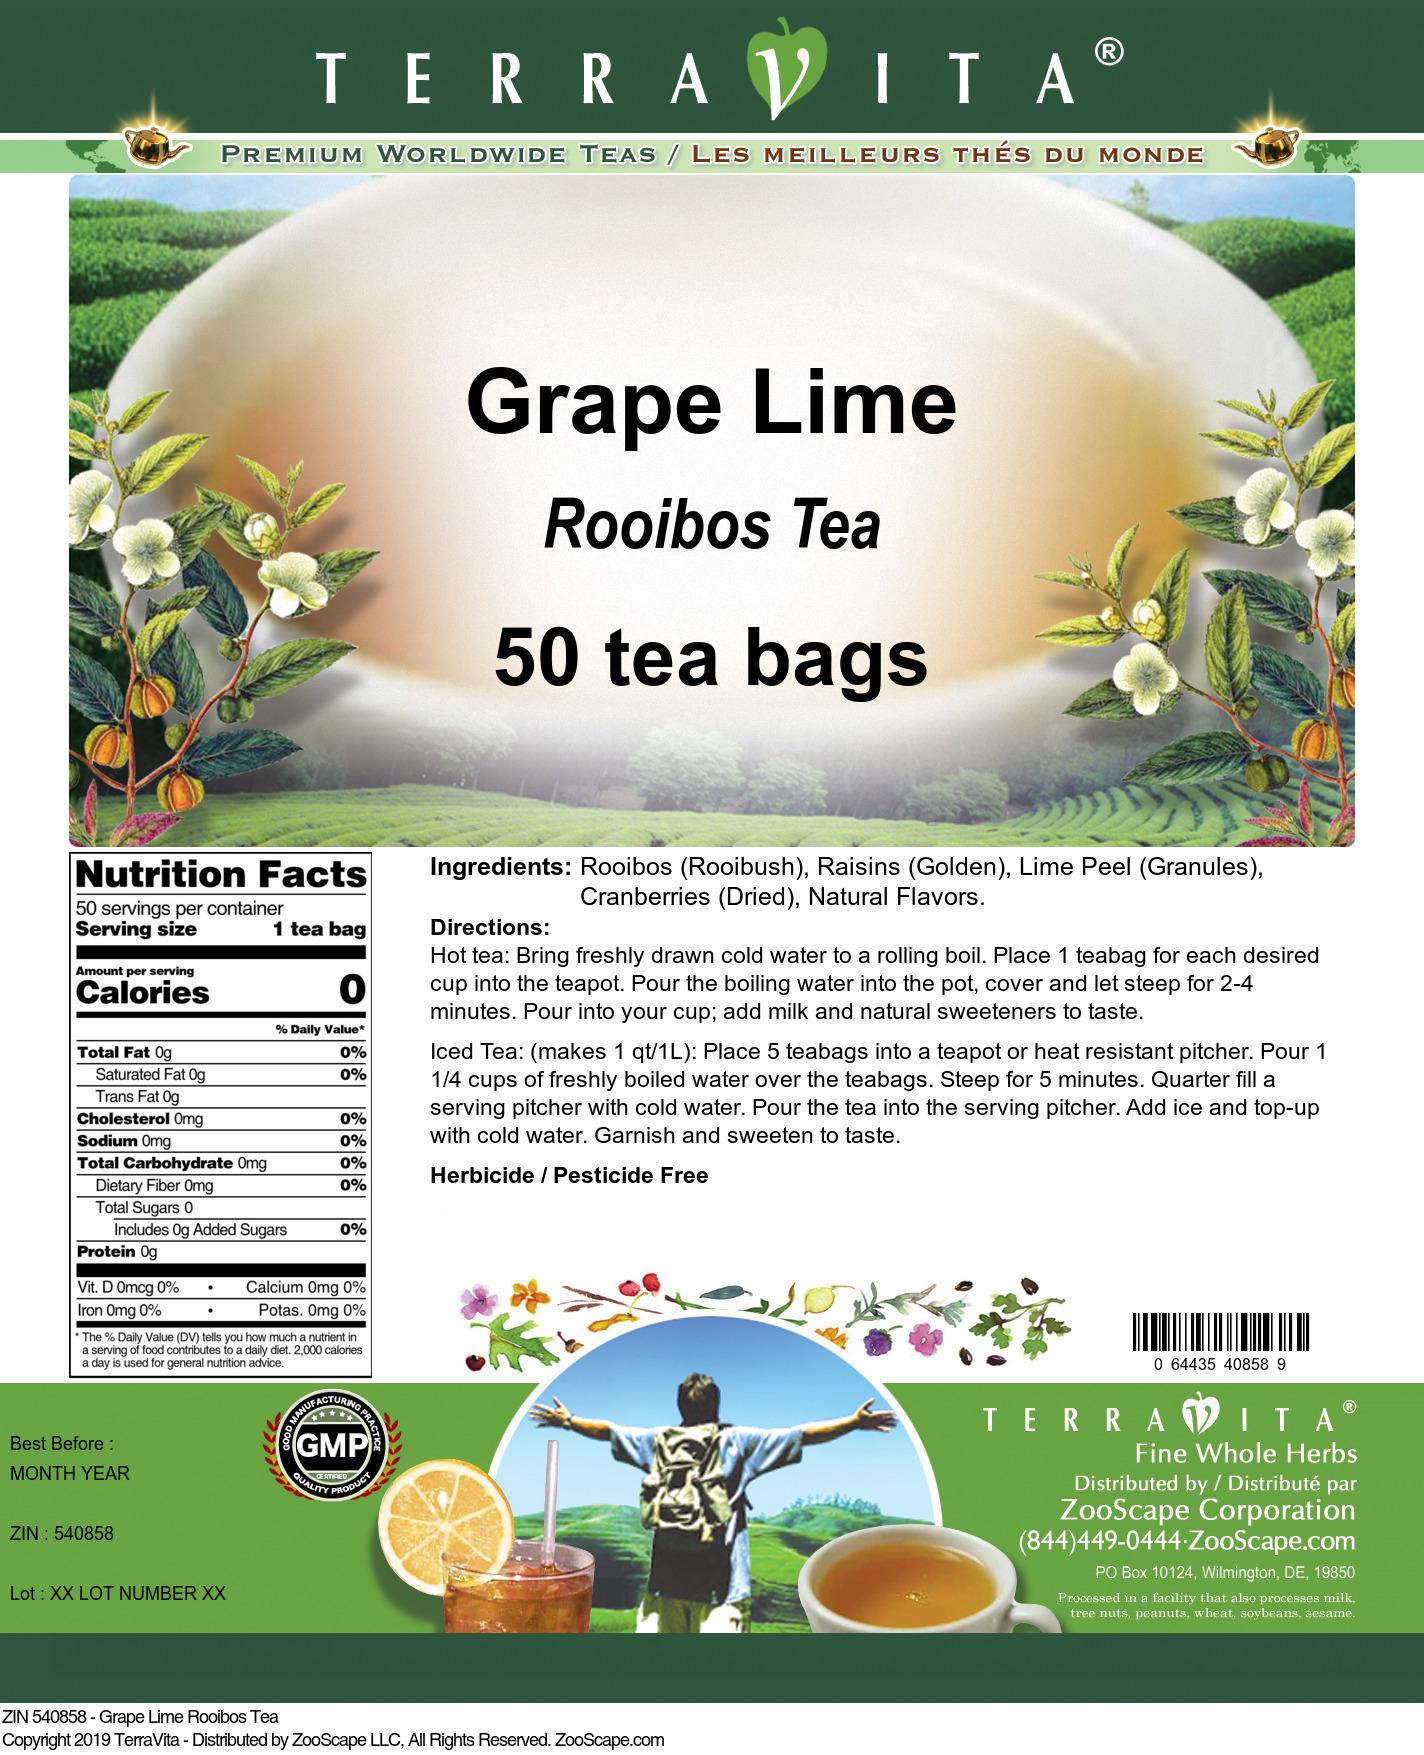 Grape Lime Rooibos Tea